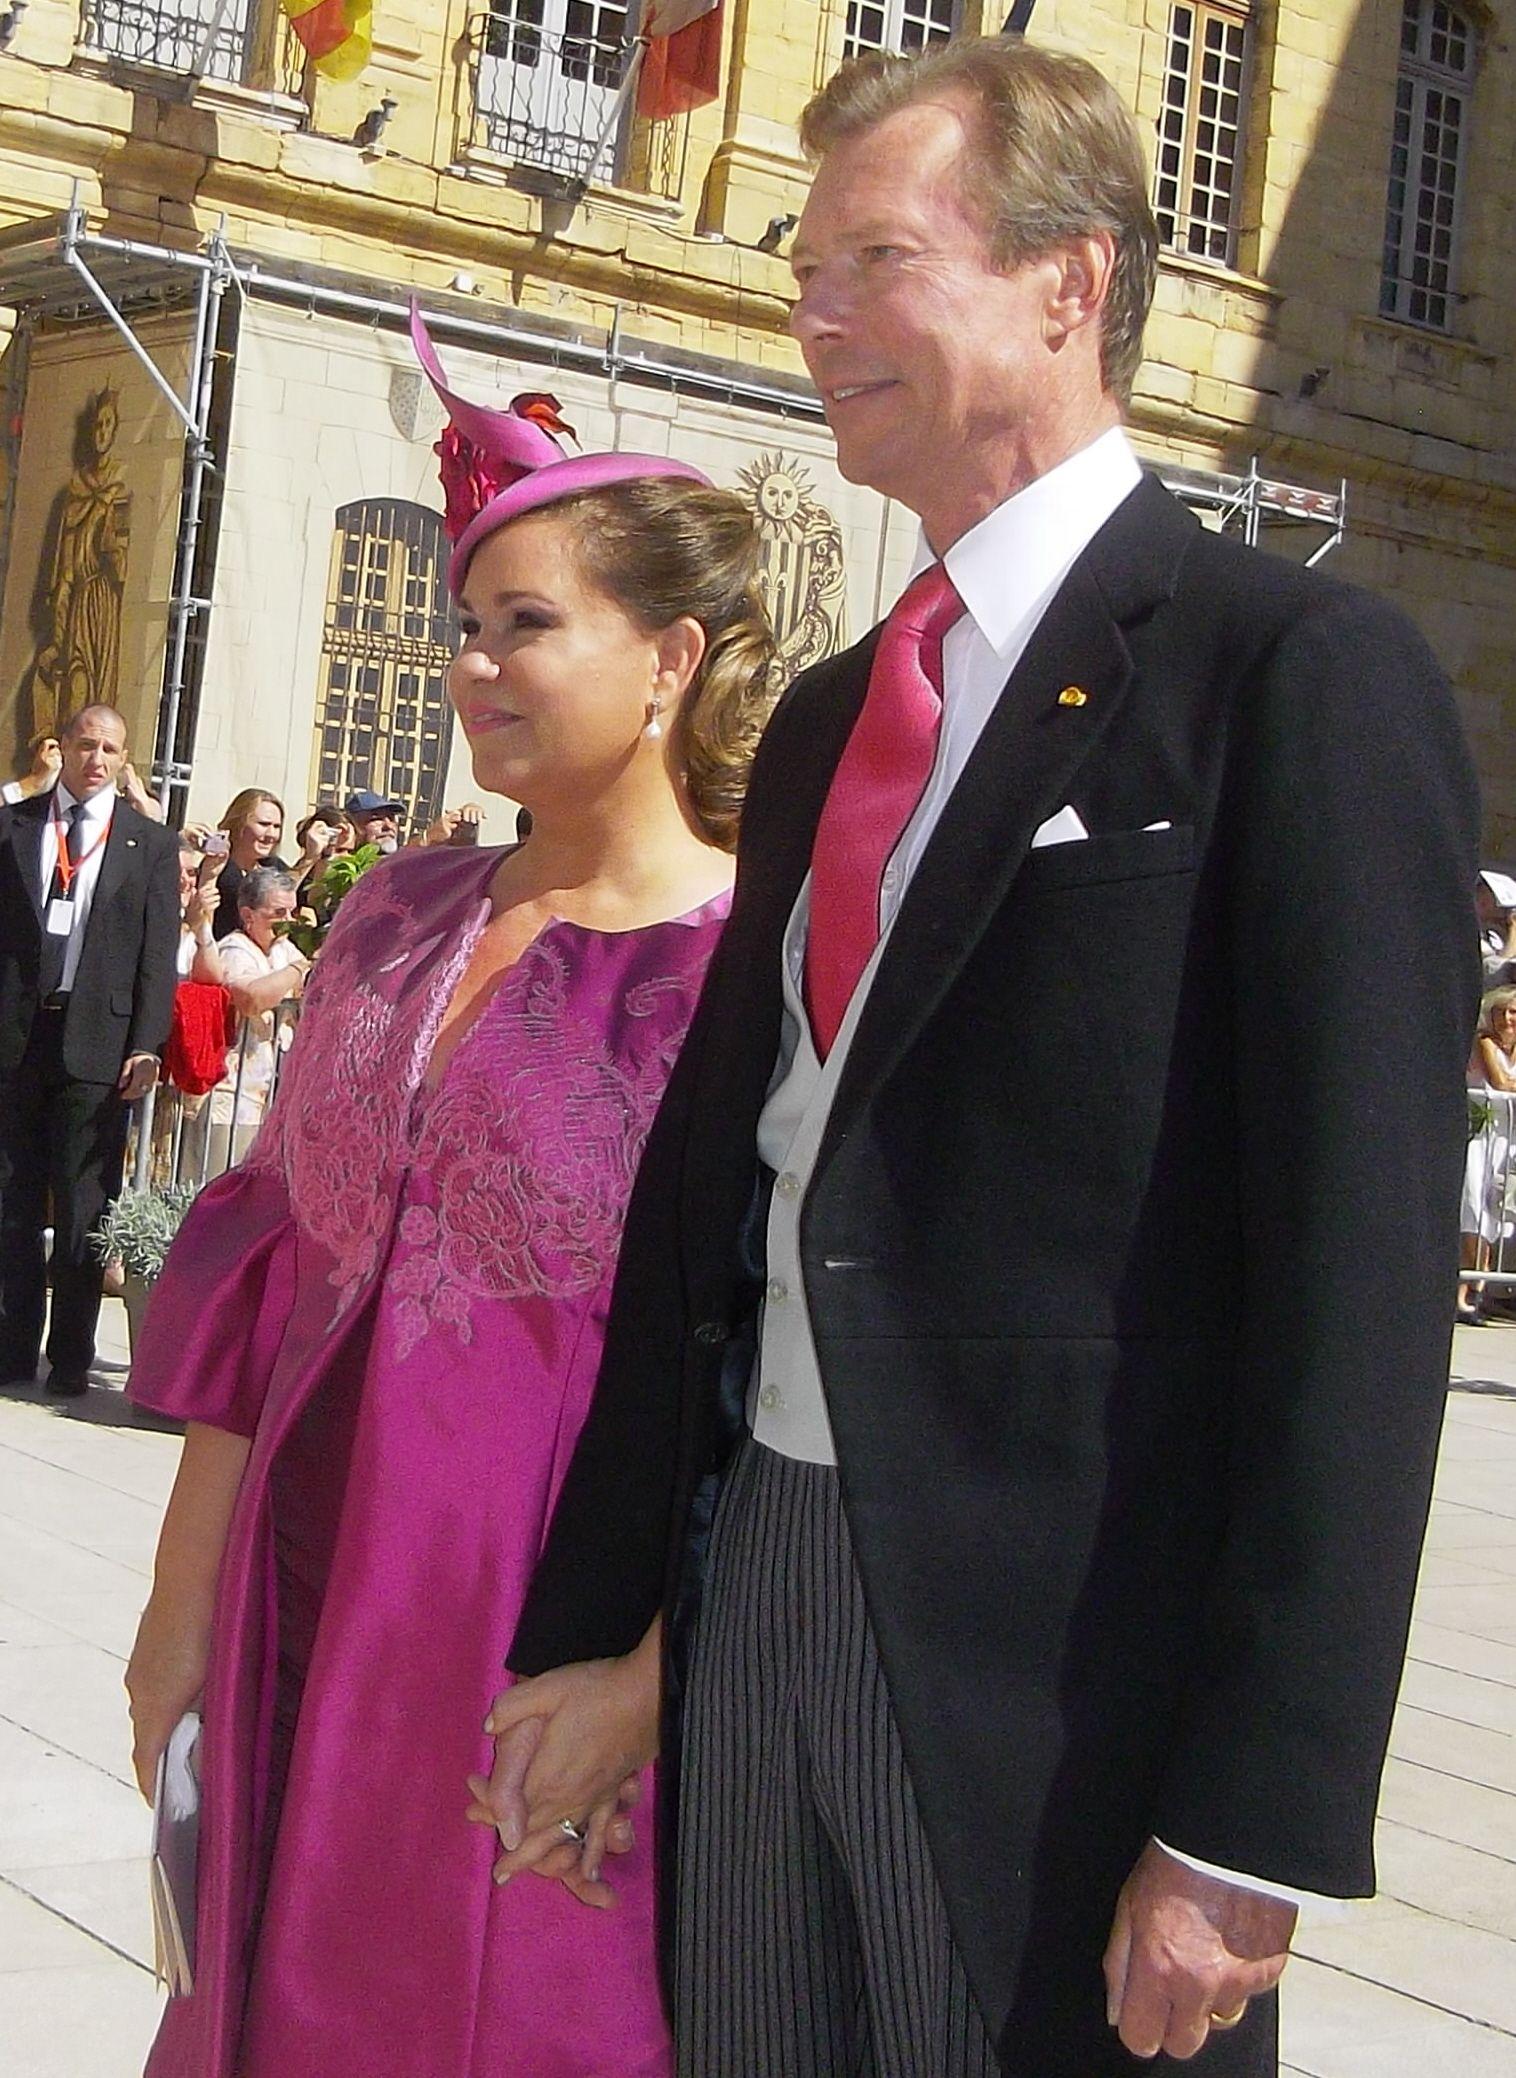 Boda de Félix de Luxemburgo y Claire Lademacher - Página 8 167e5e43